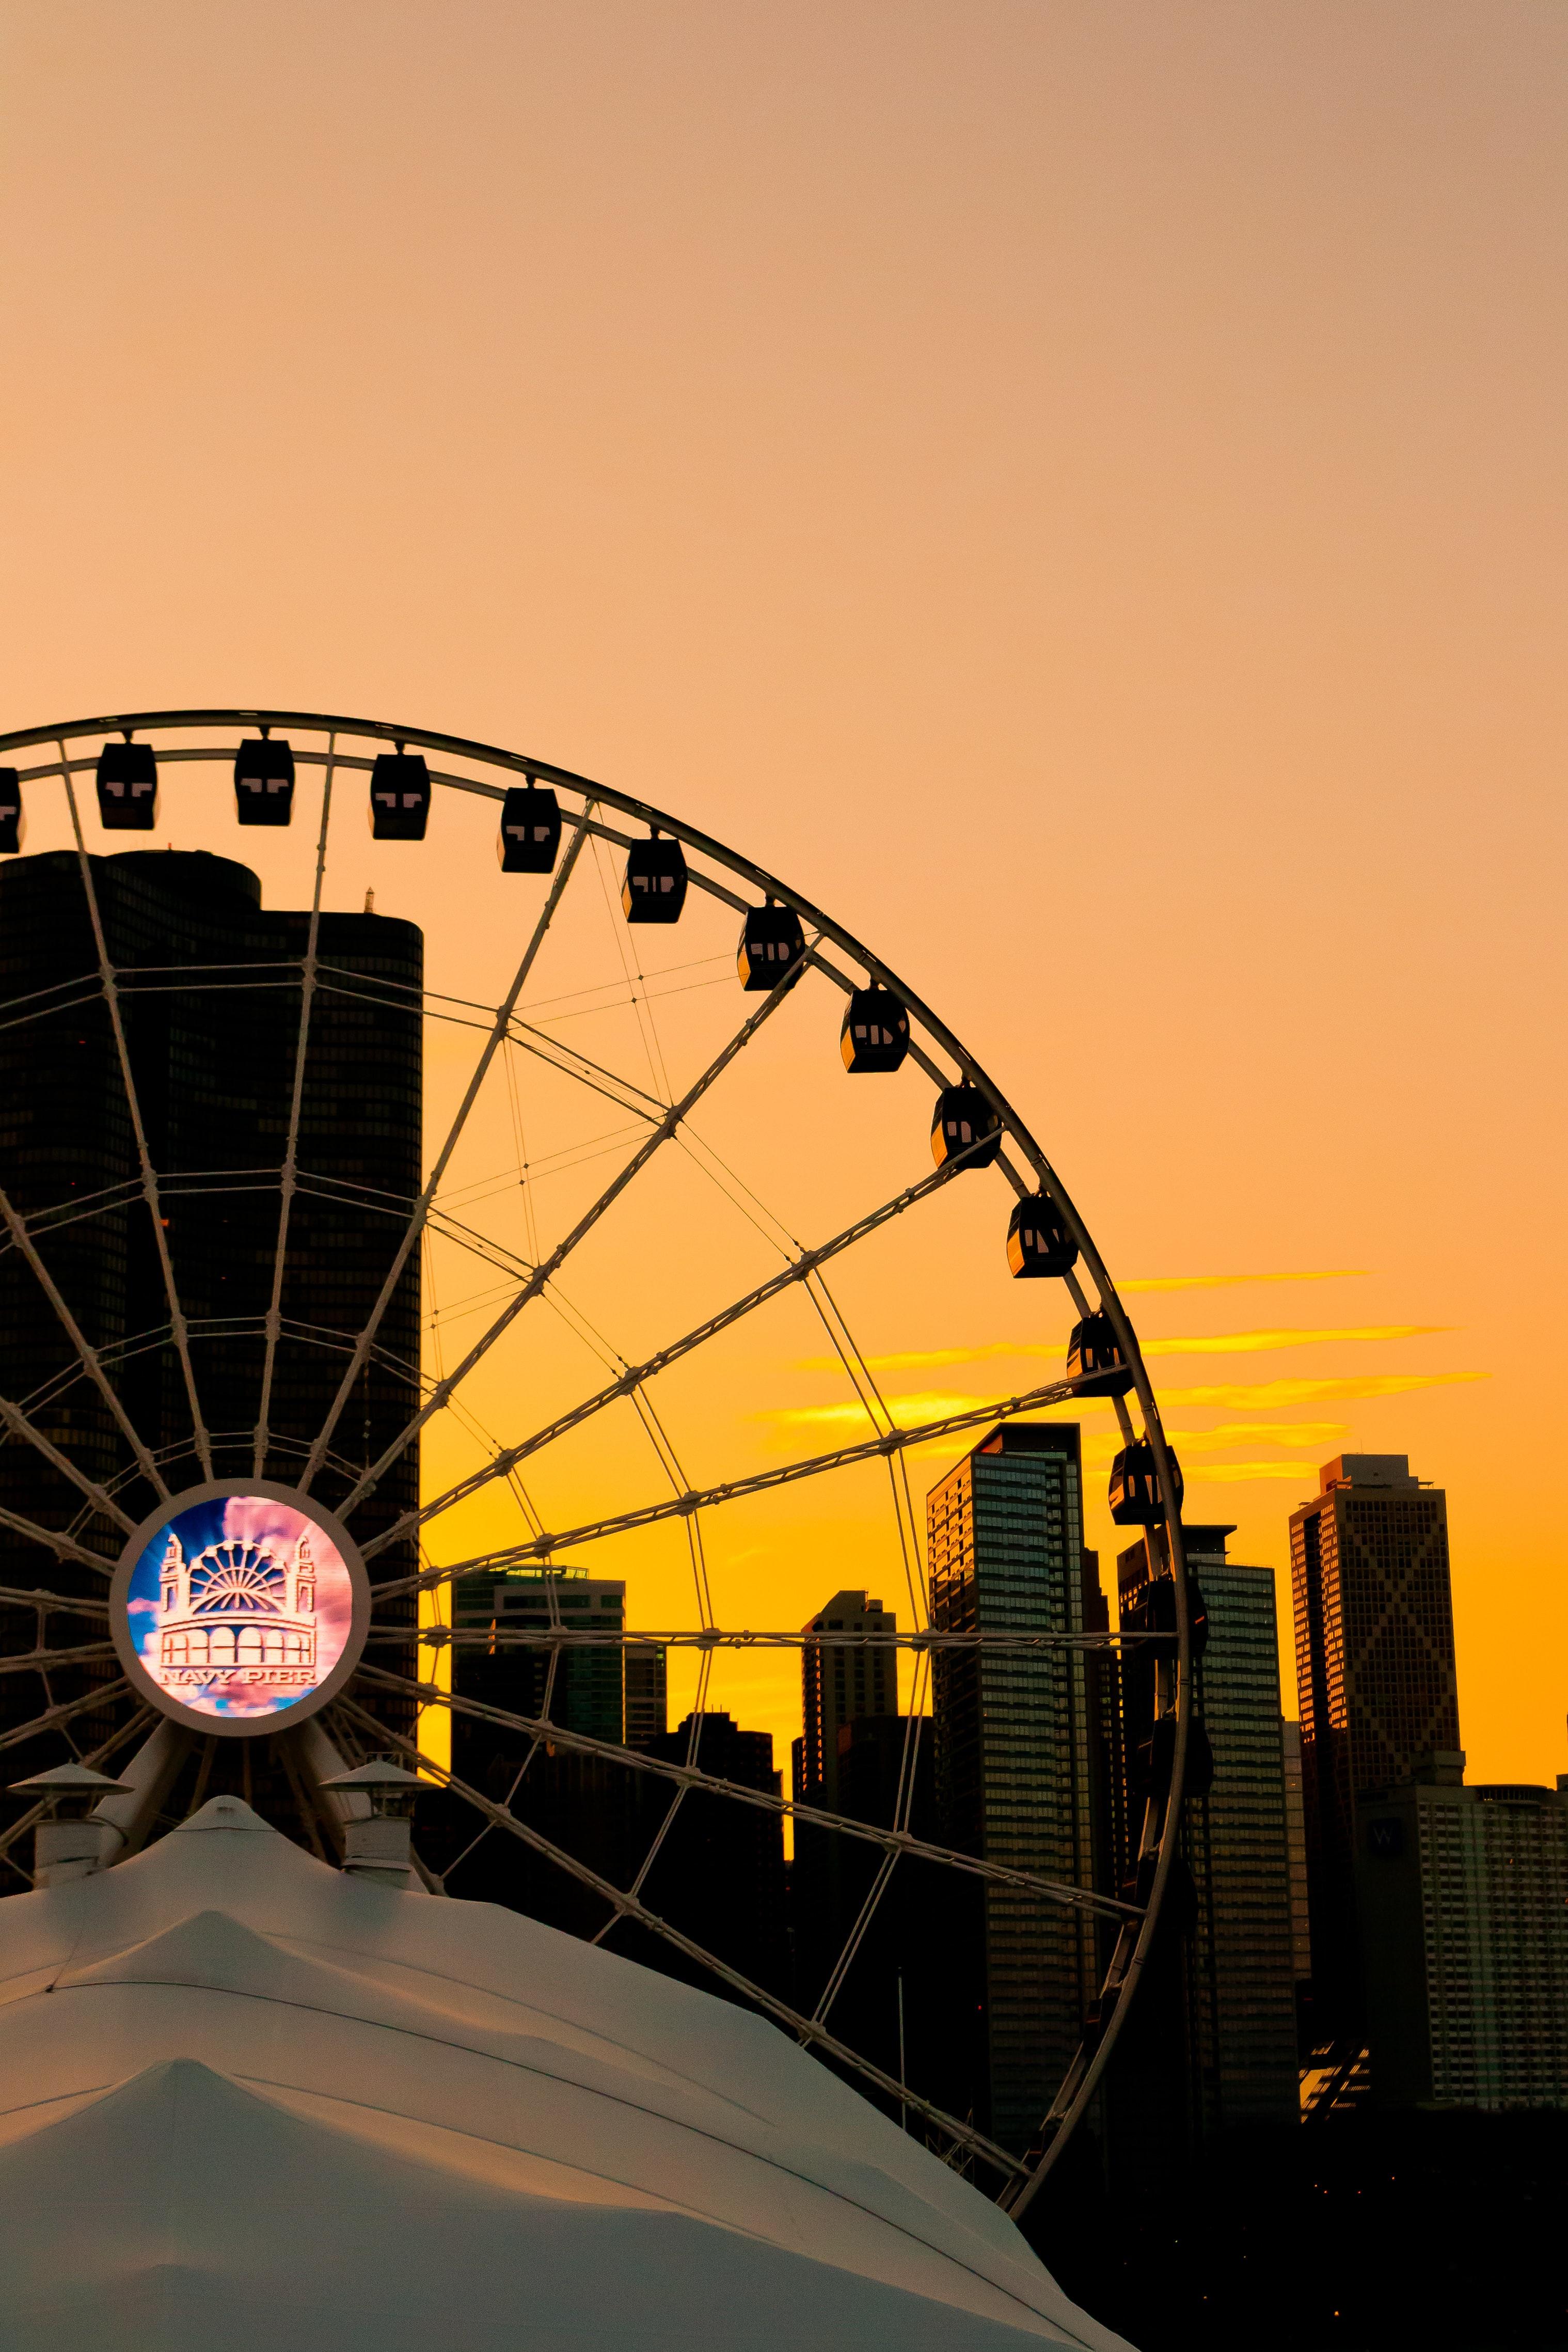 Silhouette Of Ferris Wheel During Golden Hour Photo Free Amusement Park Image On Unsplash